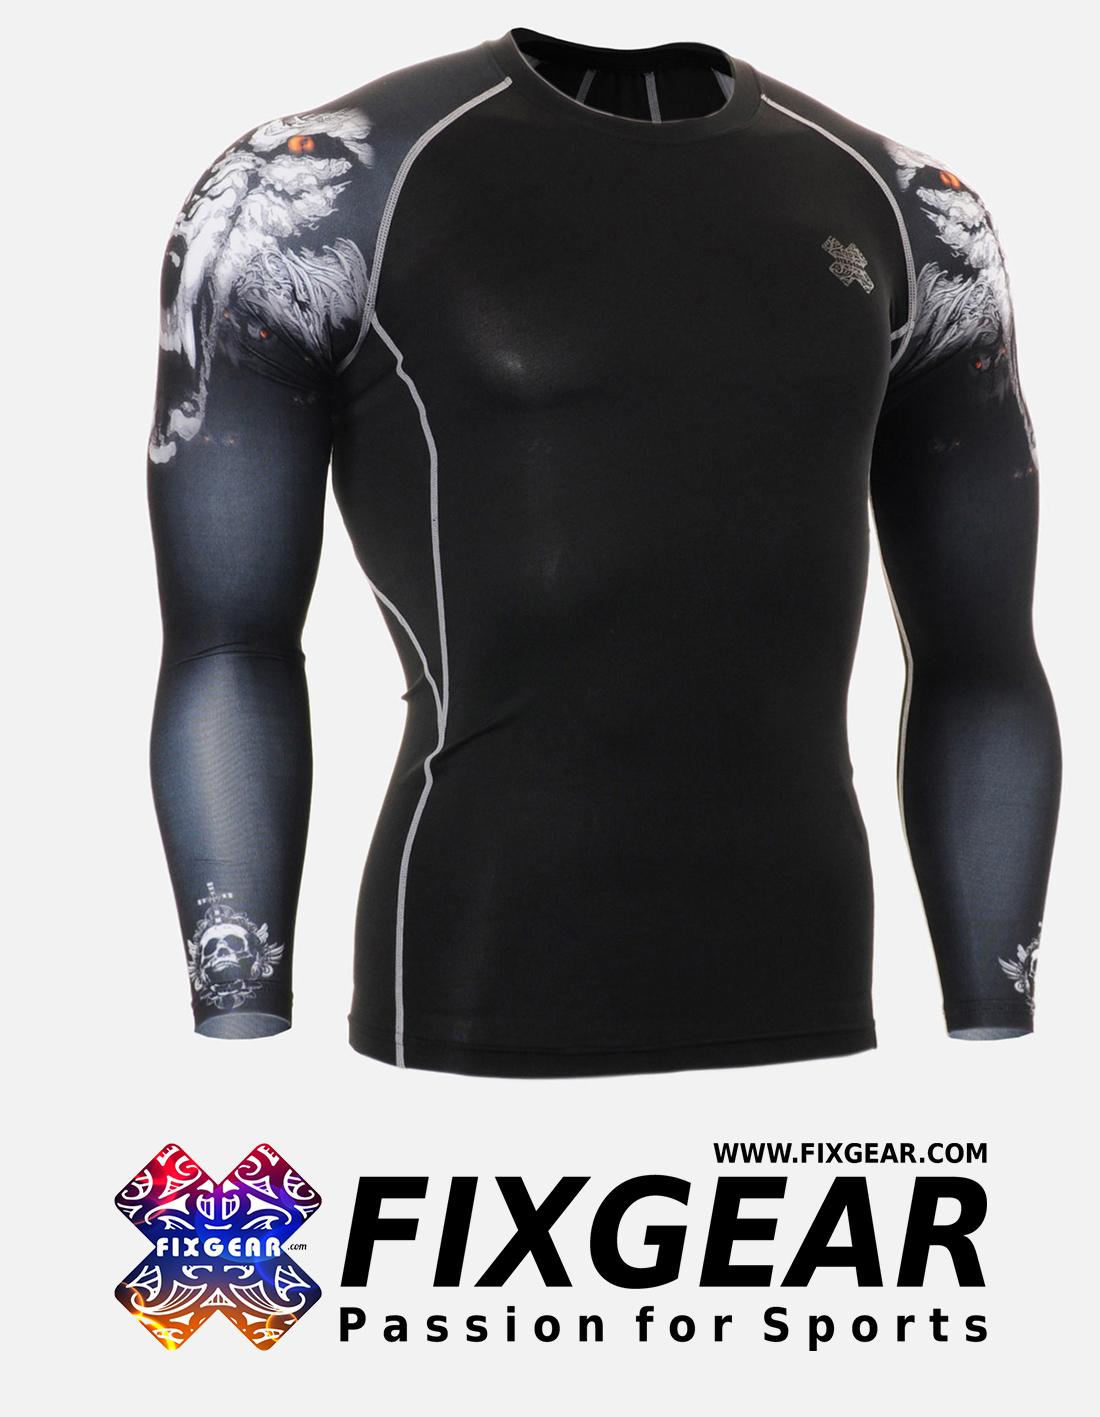 FIXGEAR CPD-B18 Compression Base Layer Shirt